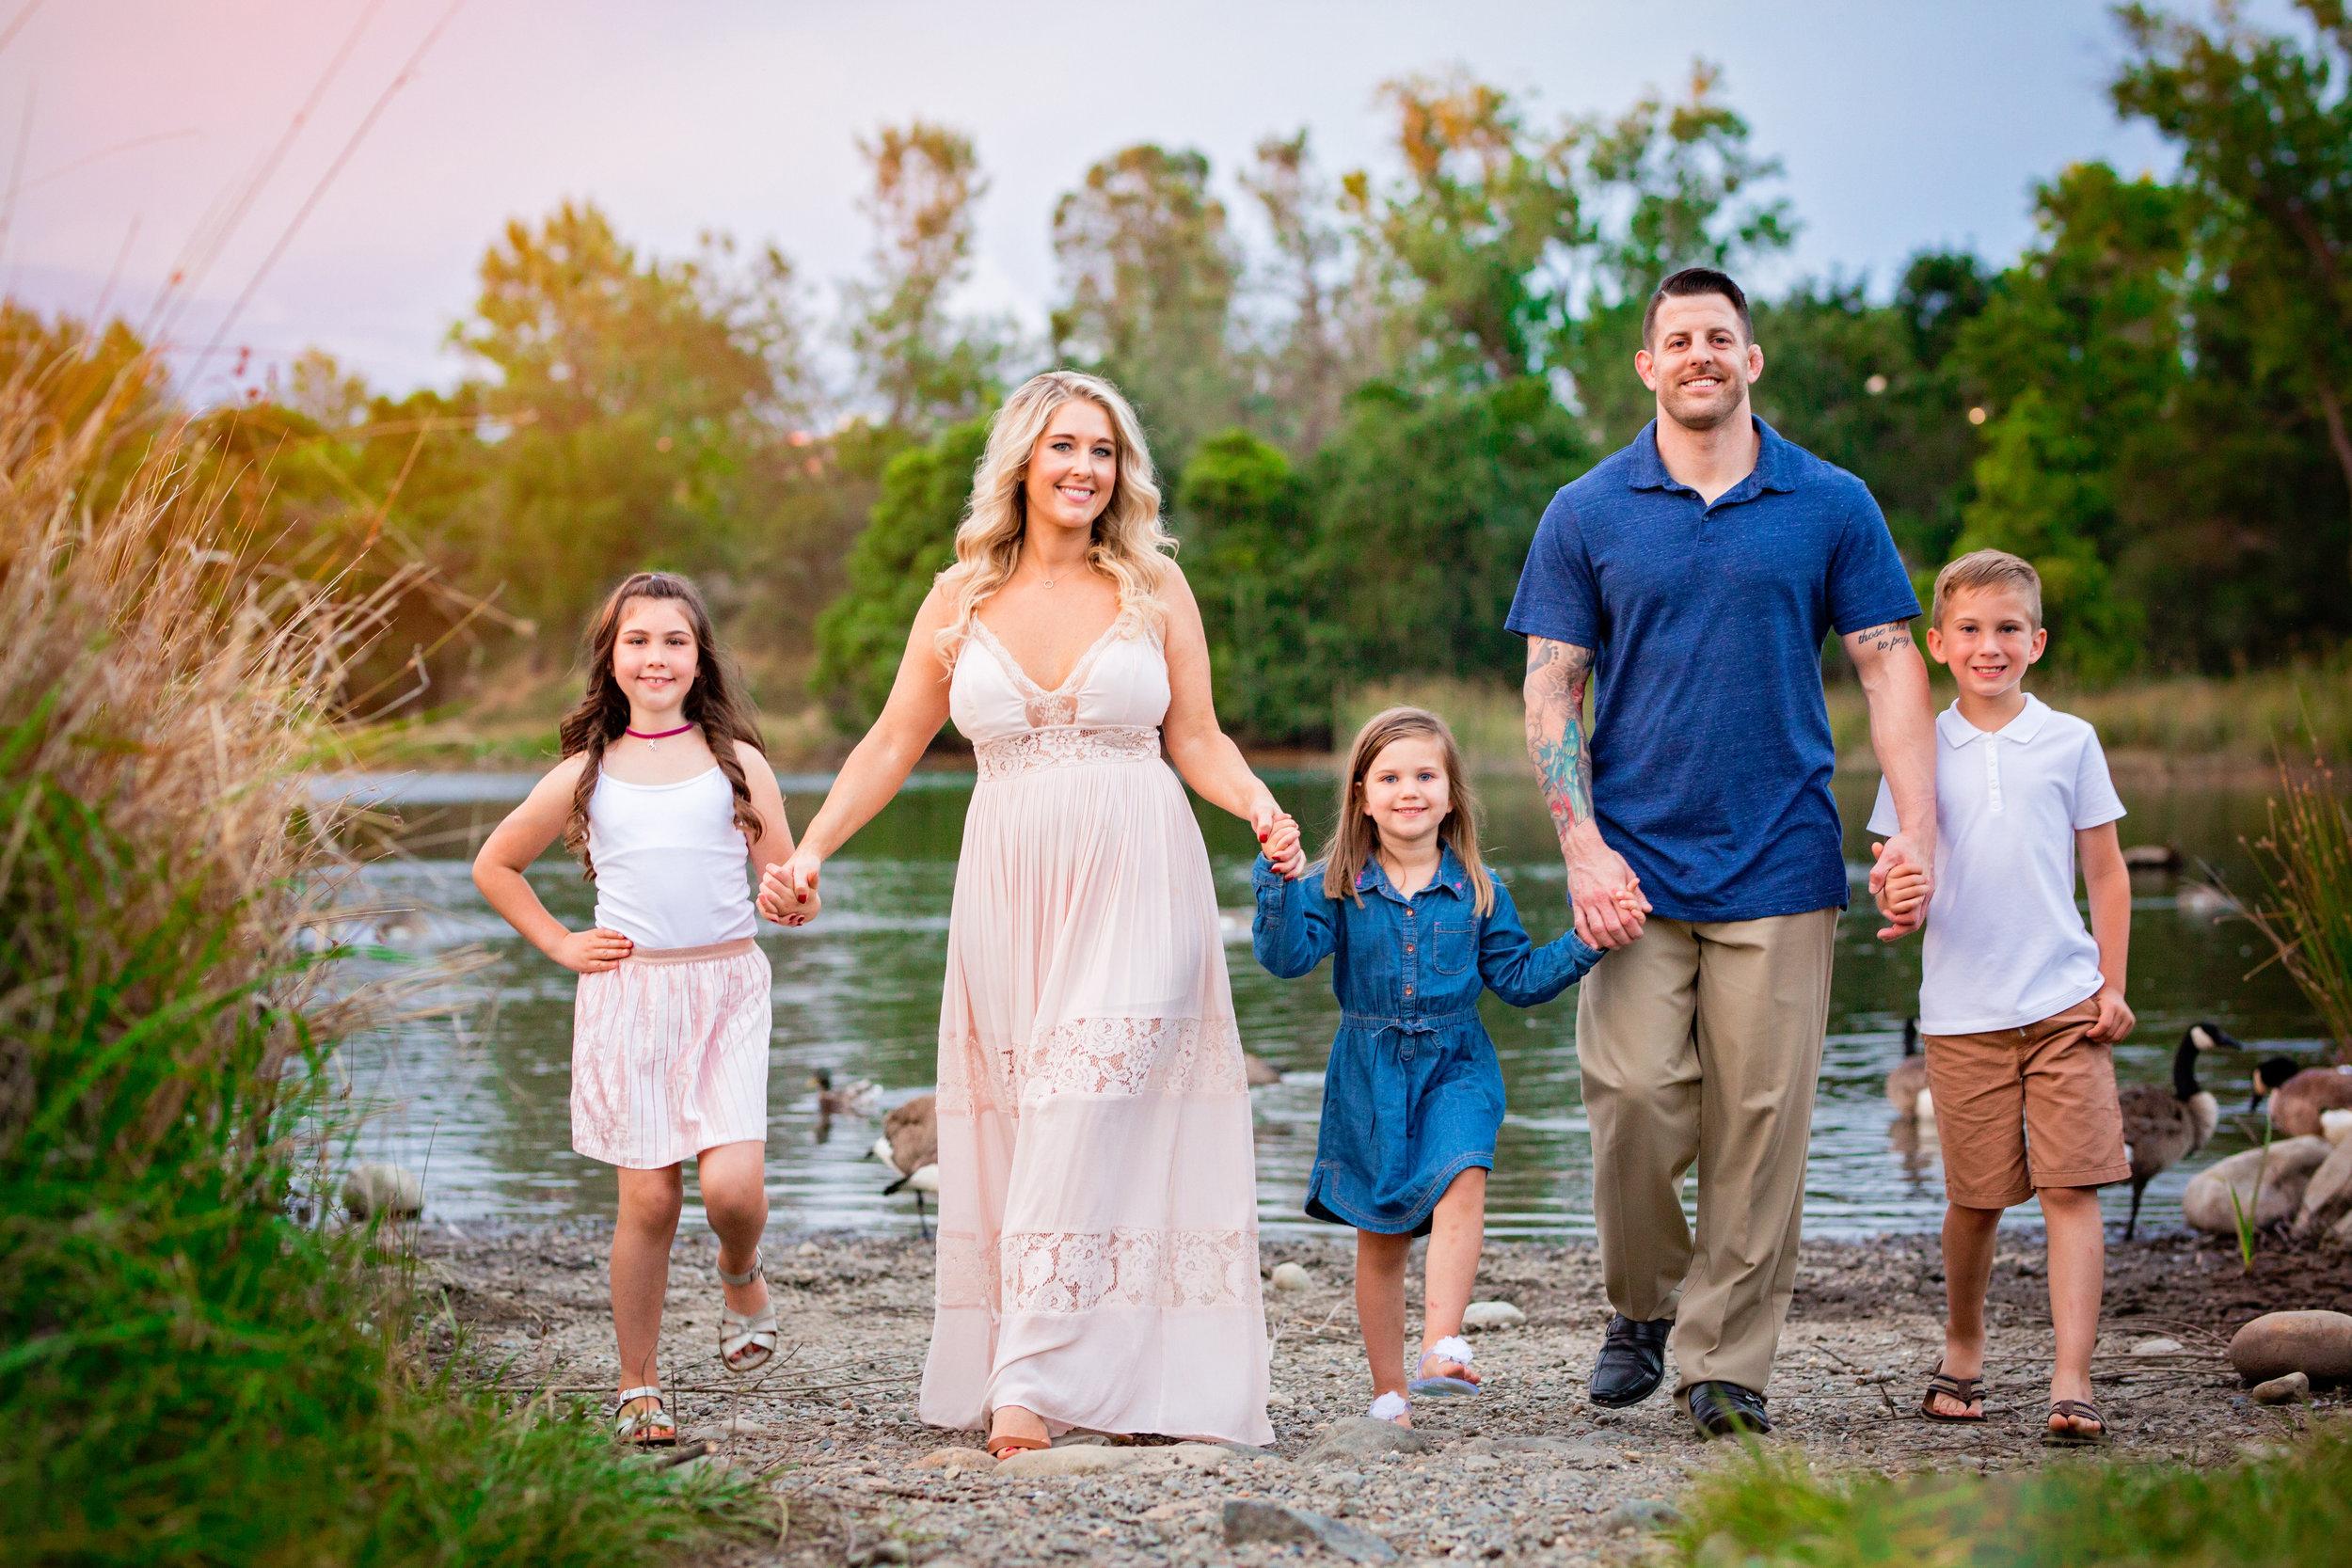 Stacie & Justin - Folsom Family Session - Sacramento Wedding Photographer - Ashley Teasley Photography (1 of 1)-4.jpg